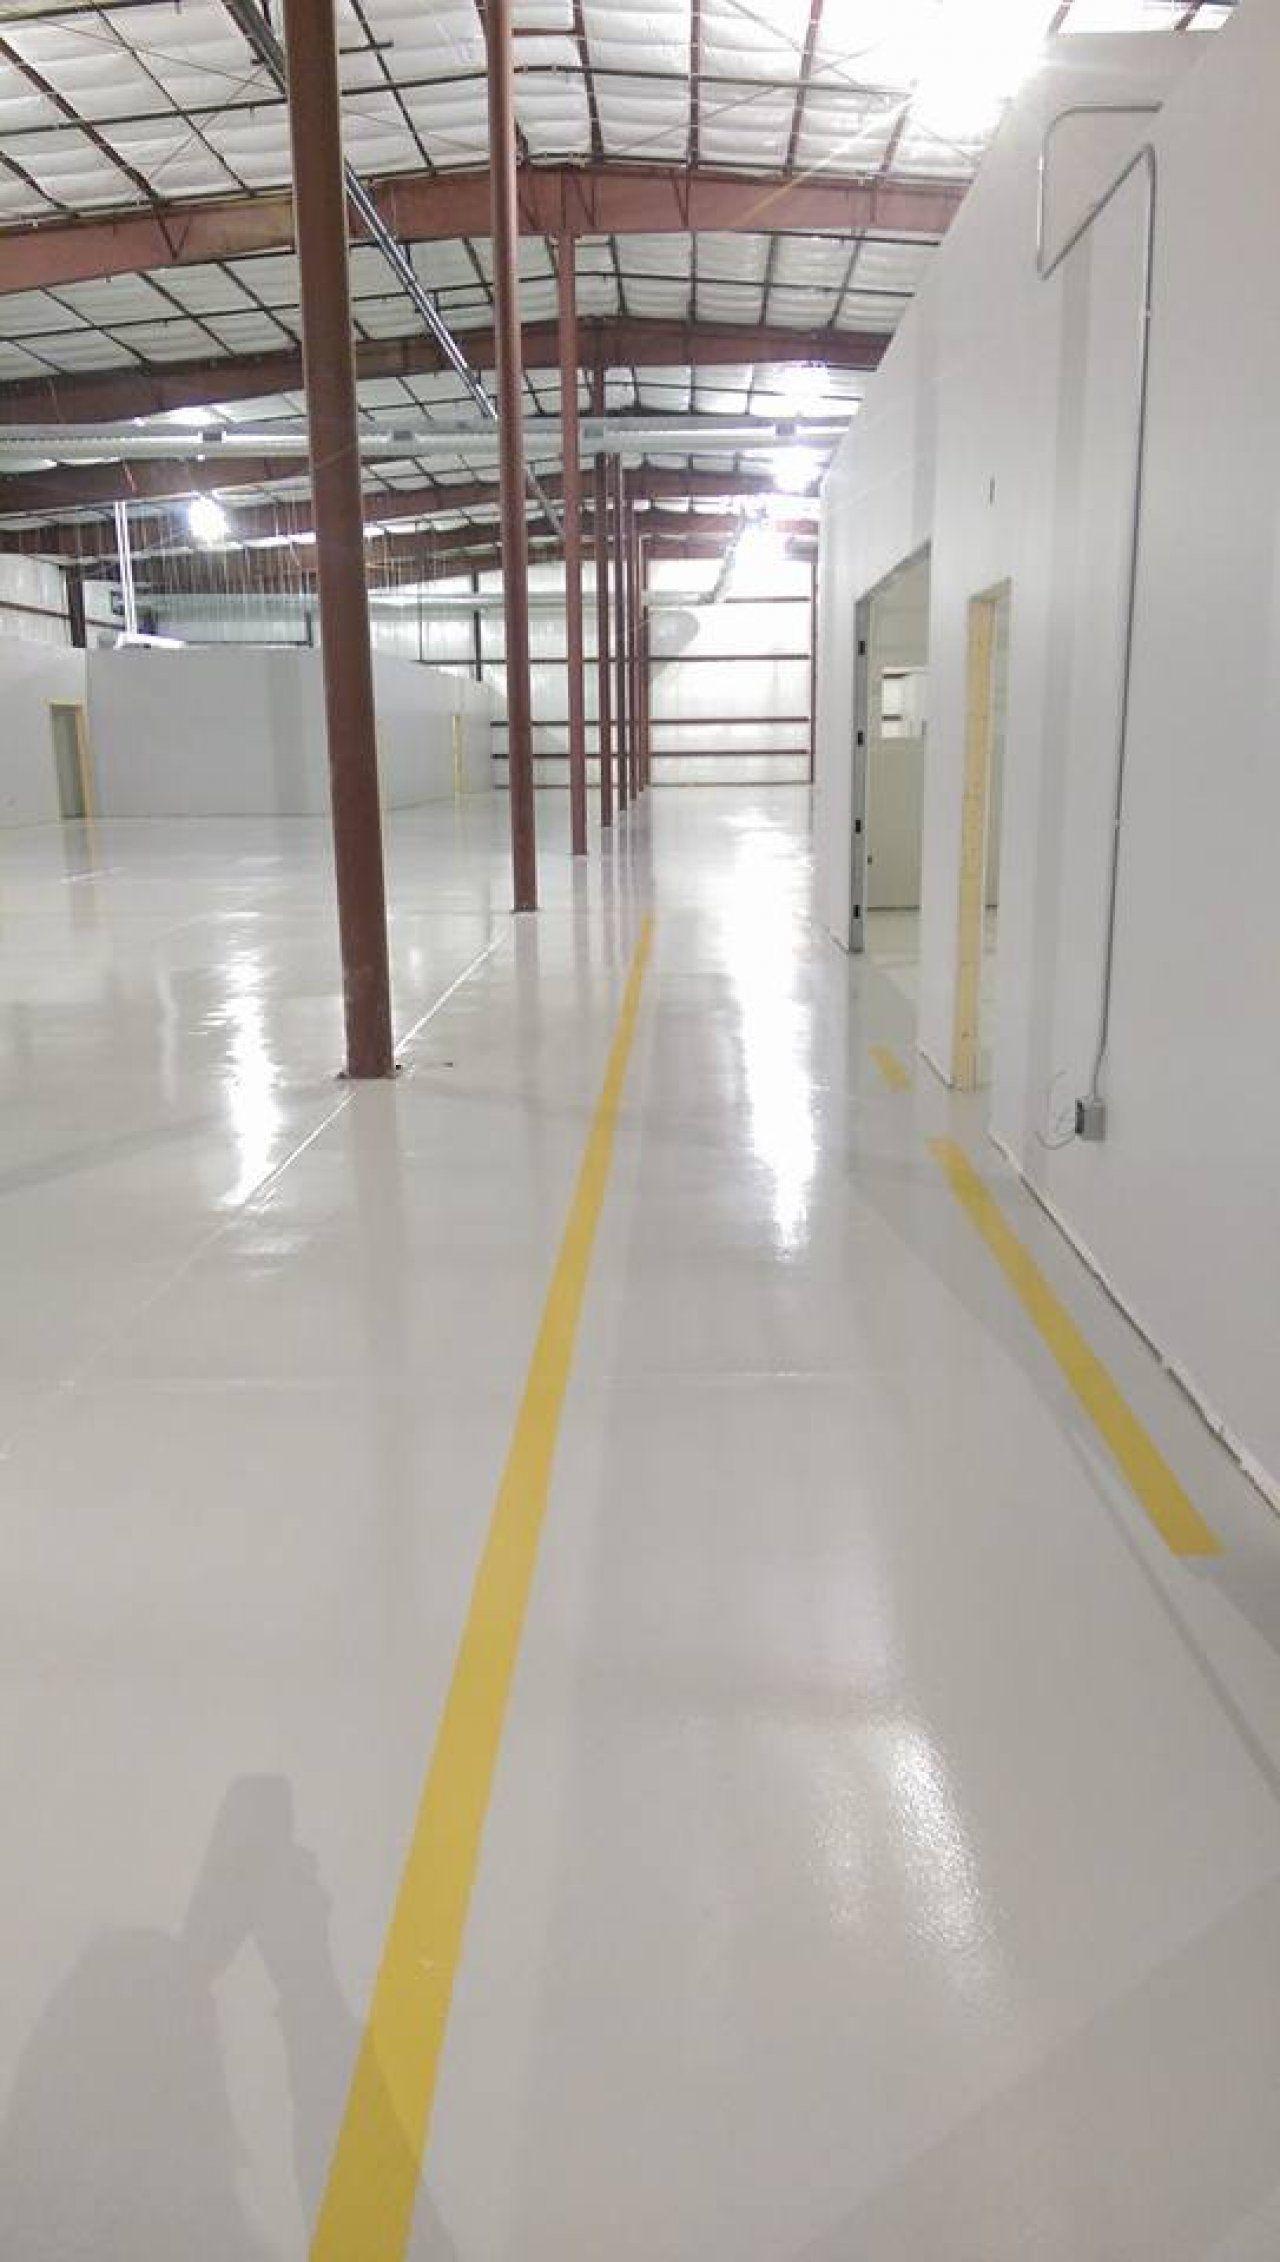 123 Resinous Epoxy Floor In Factory In Des Moines Iowa In 2020 Concrete Decor Des Moines Epoxy Floor